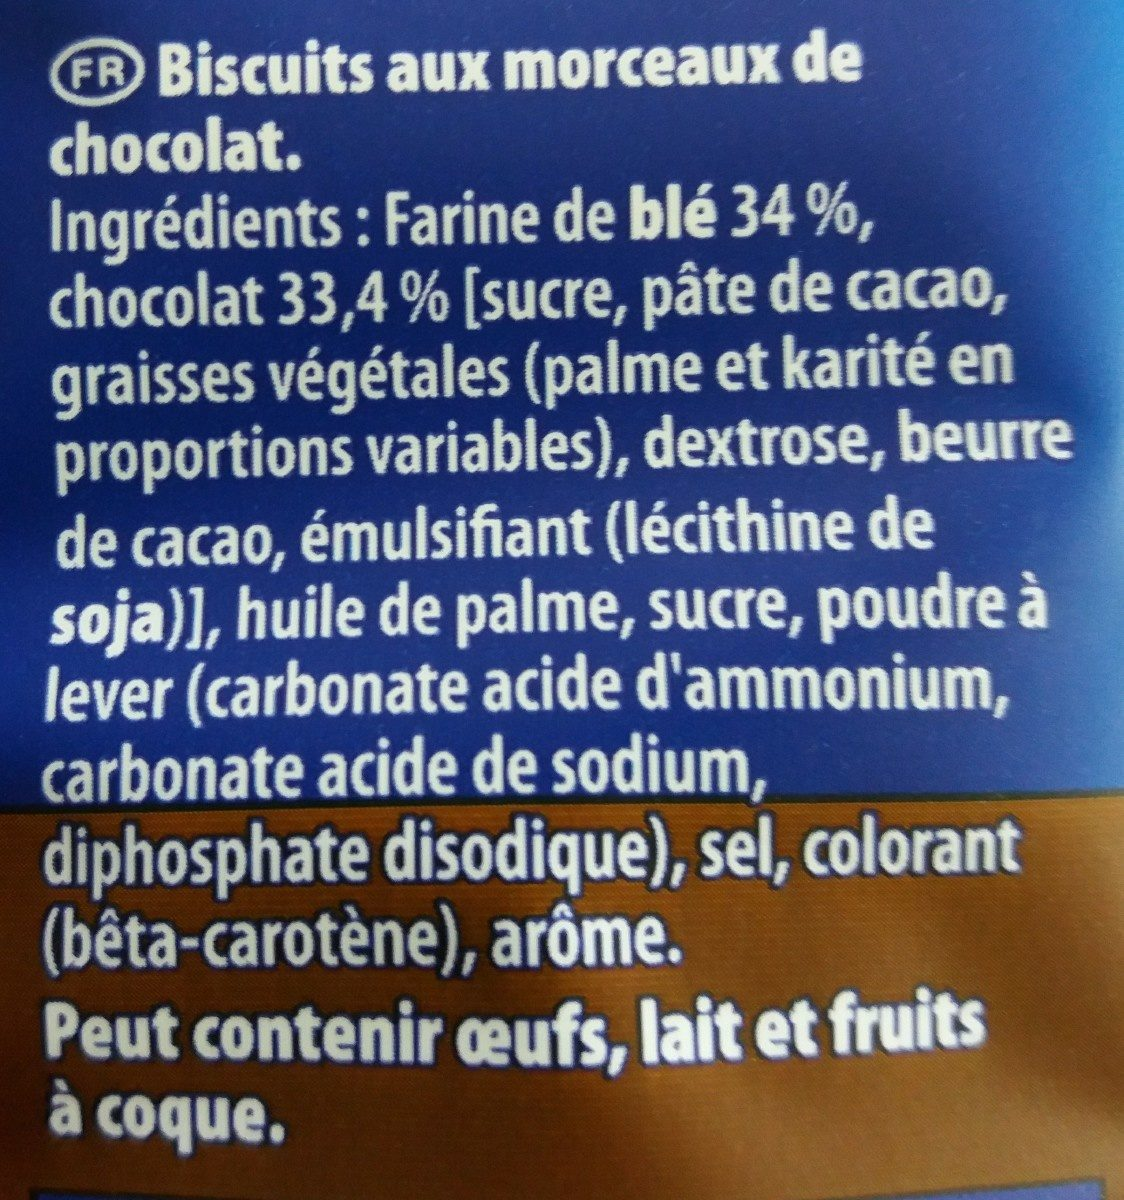 Granola L'original Gros éclats de chocolat - Ingredients - fr